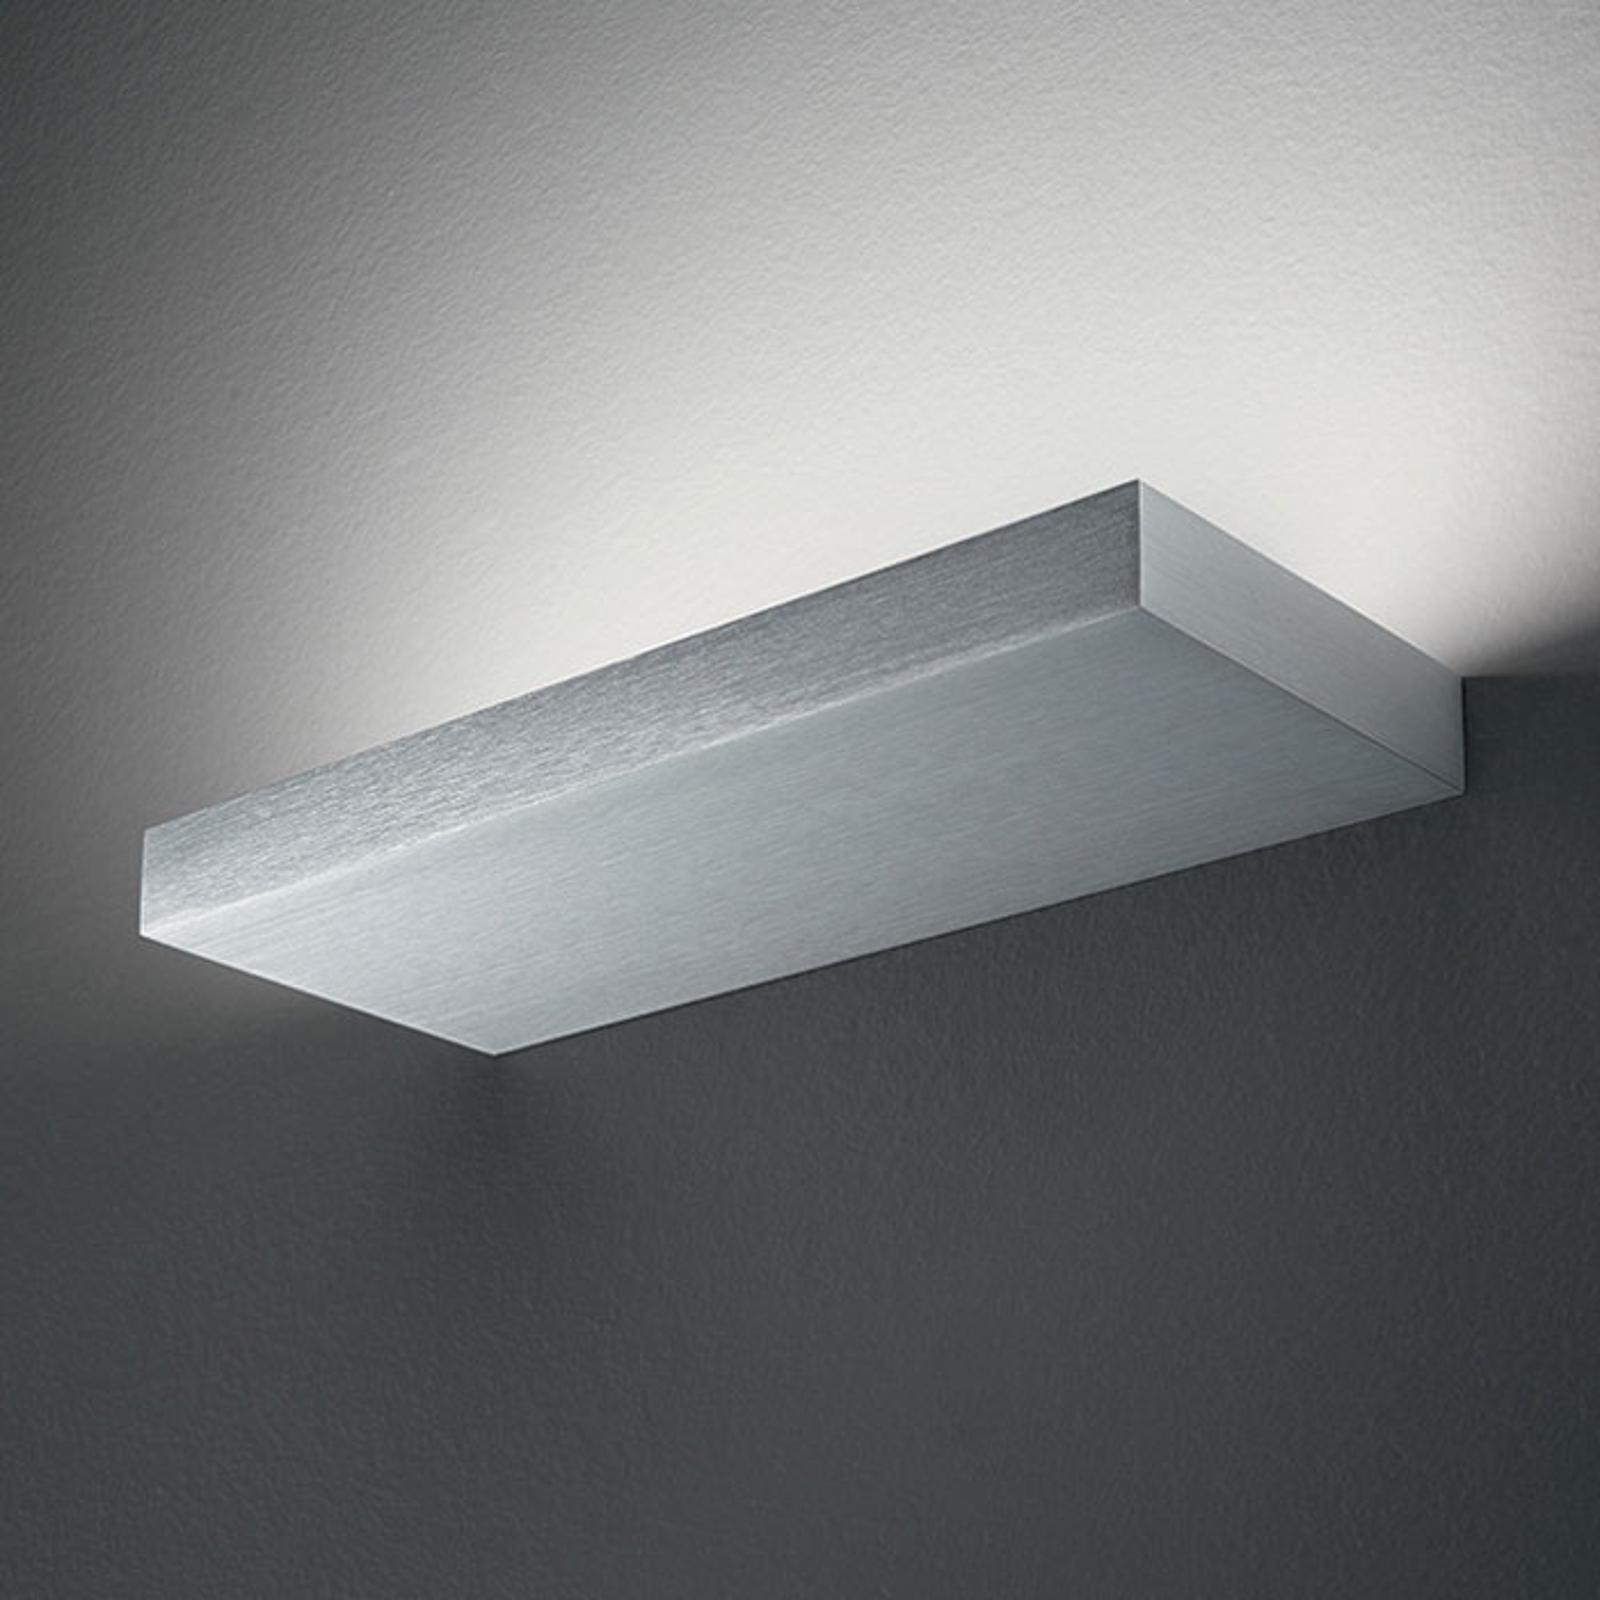 LED-Wandleuchte Regolo, Länge 32,3 cm, Aluminium